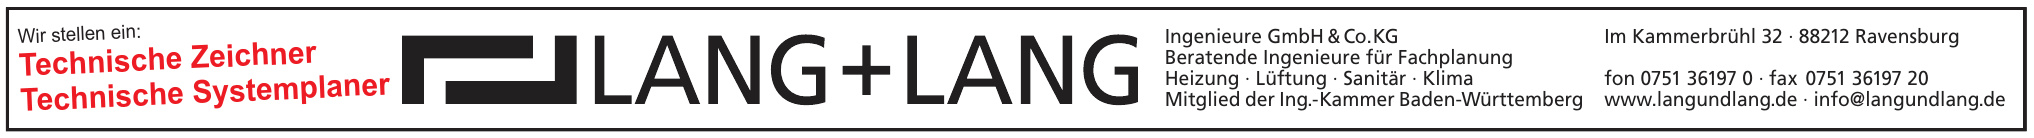 Ingenieure GmbH & Co. KG